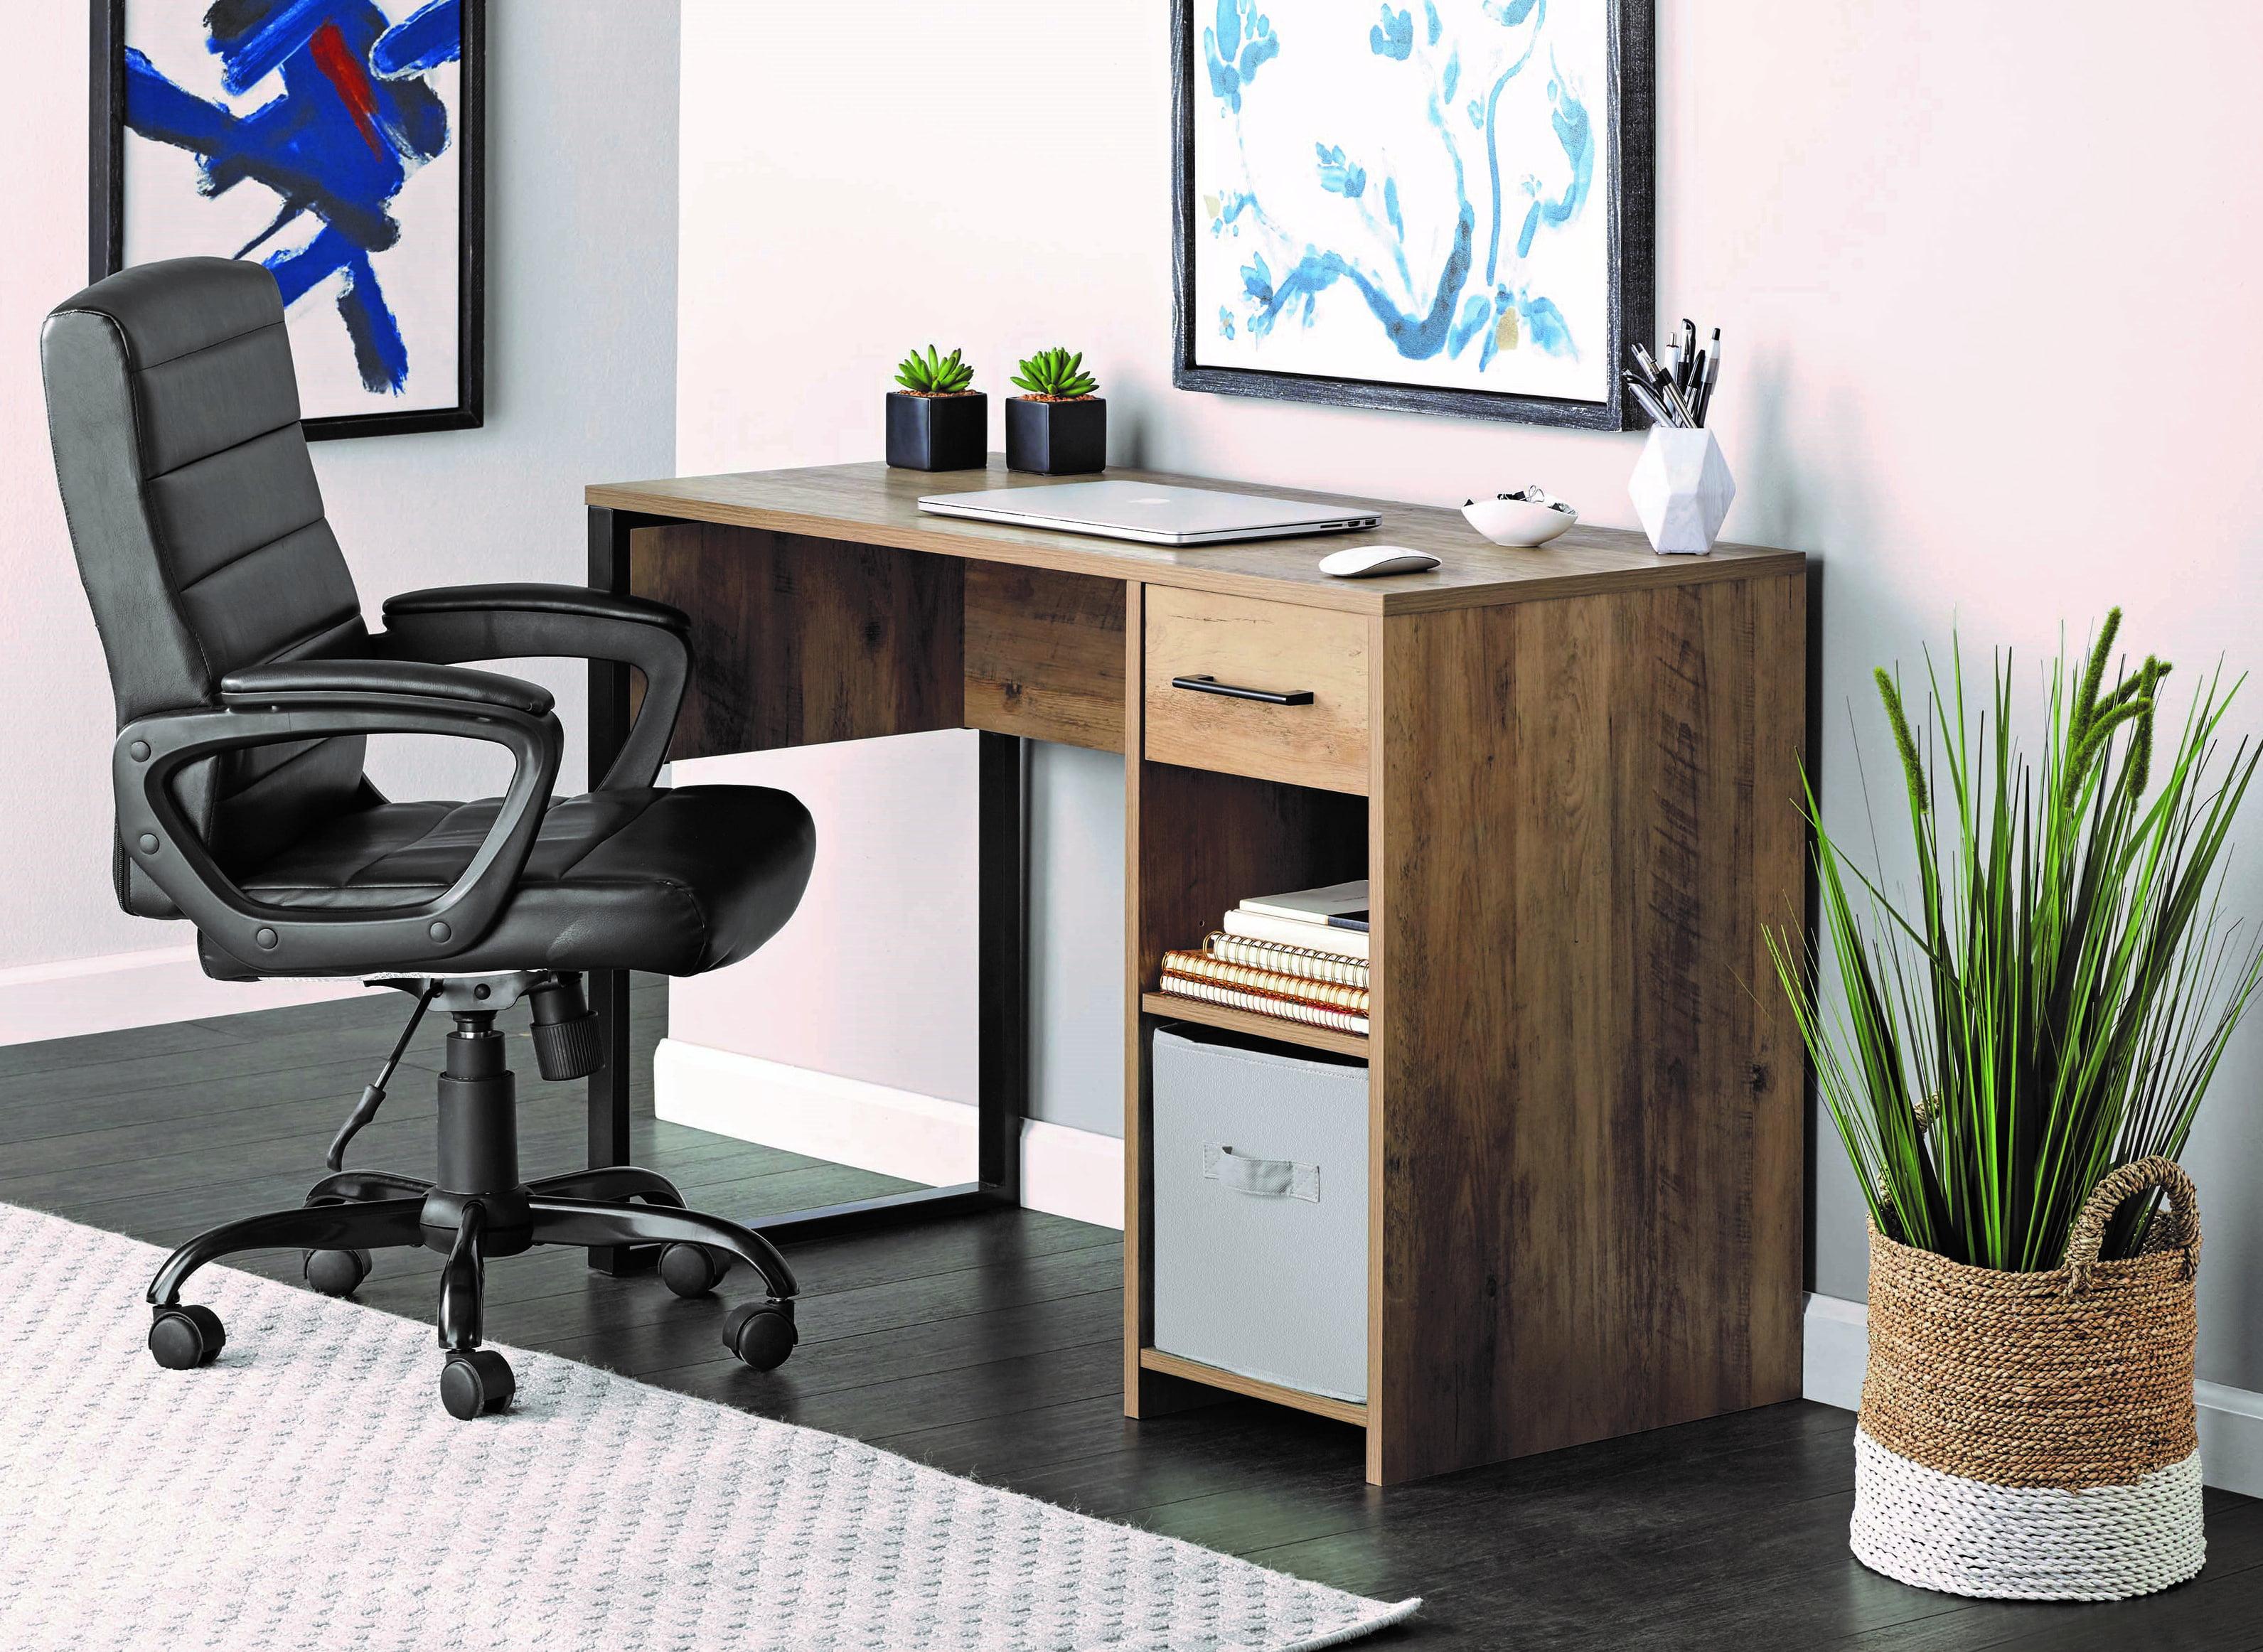 Mainstays Wood Metal Desk Rustic Weathered Oak Finish Walmart Com Walmart Com